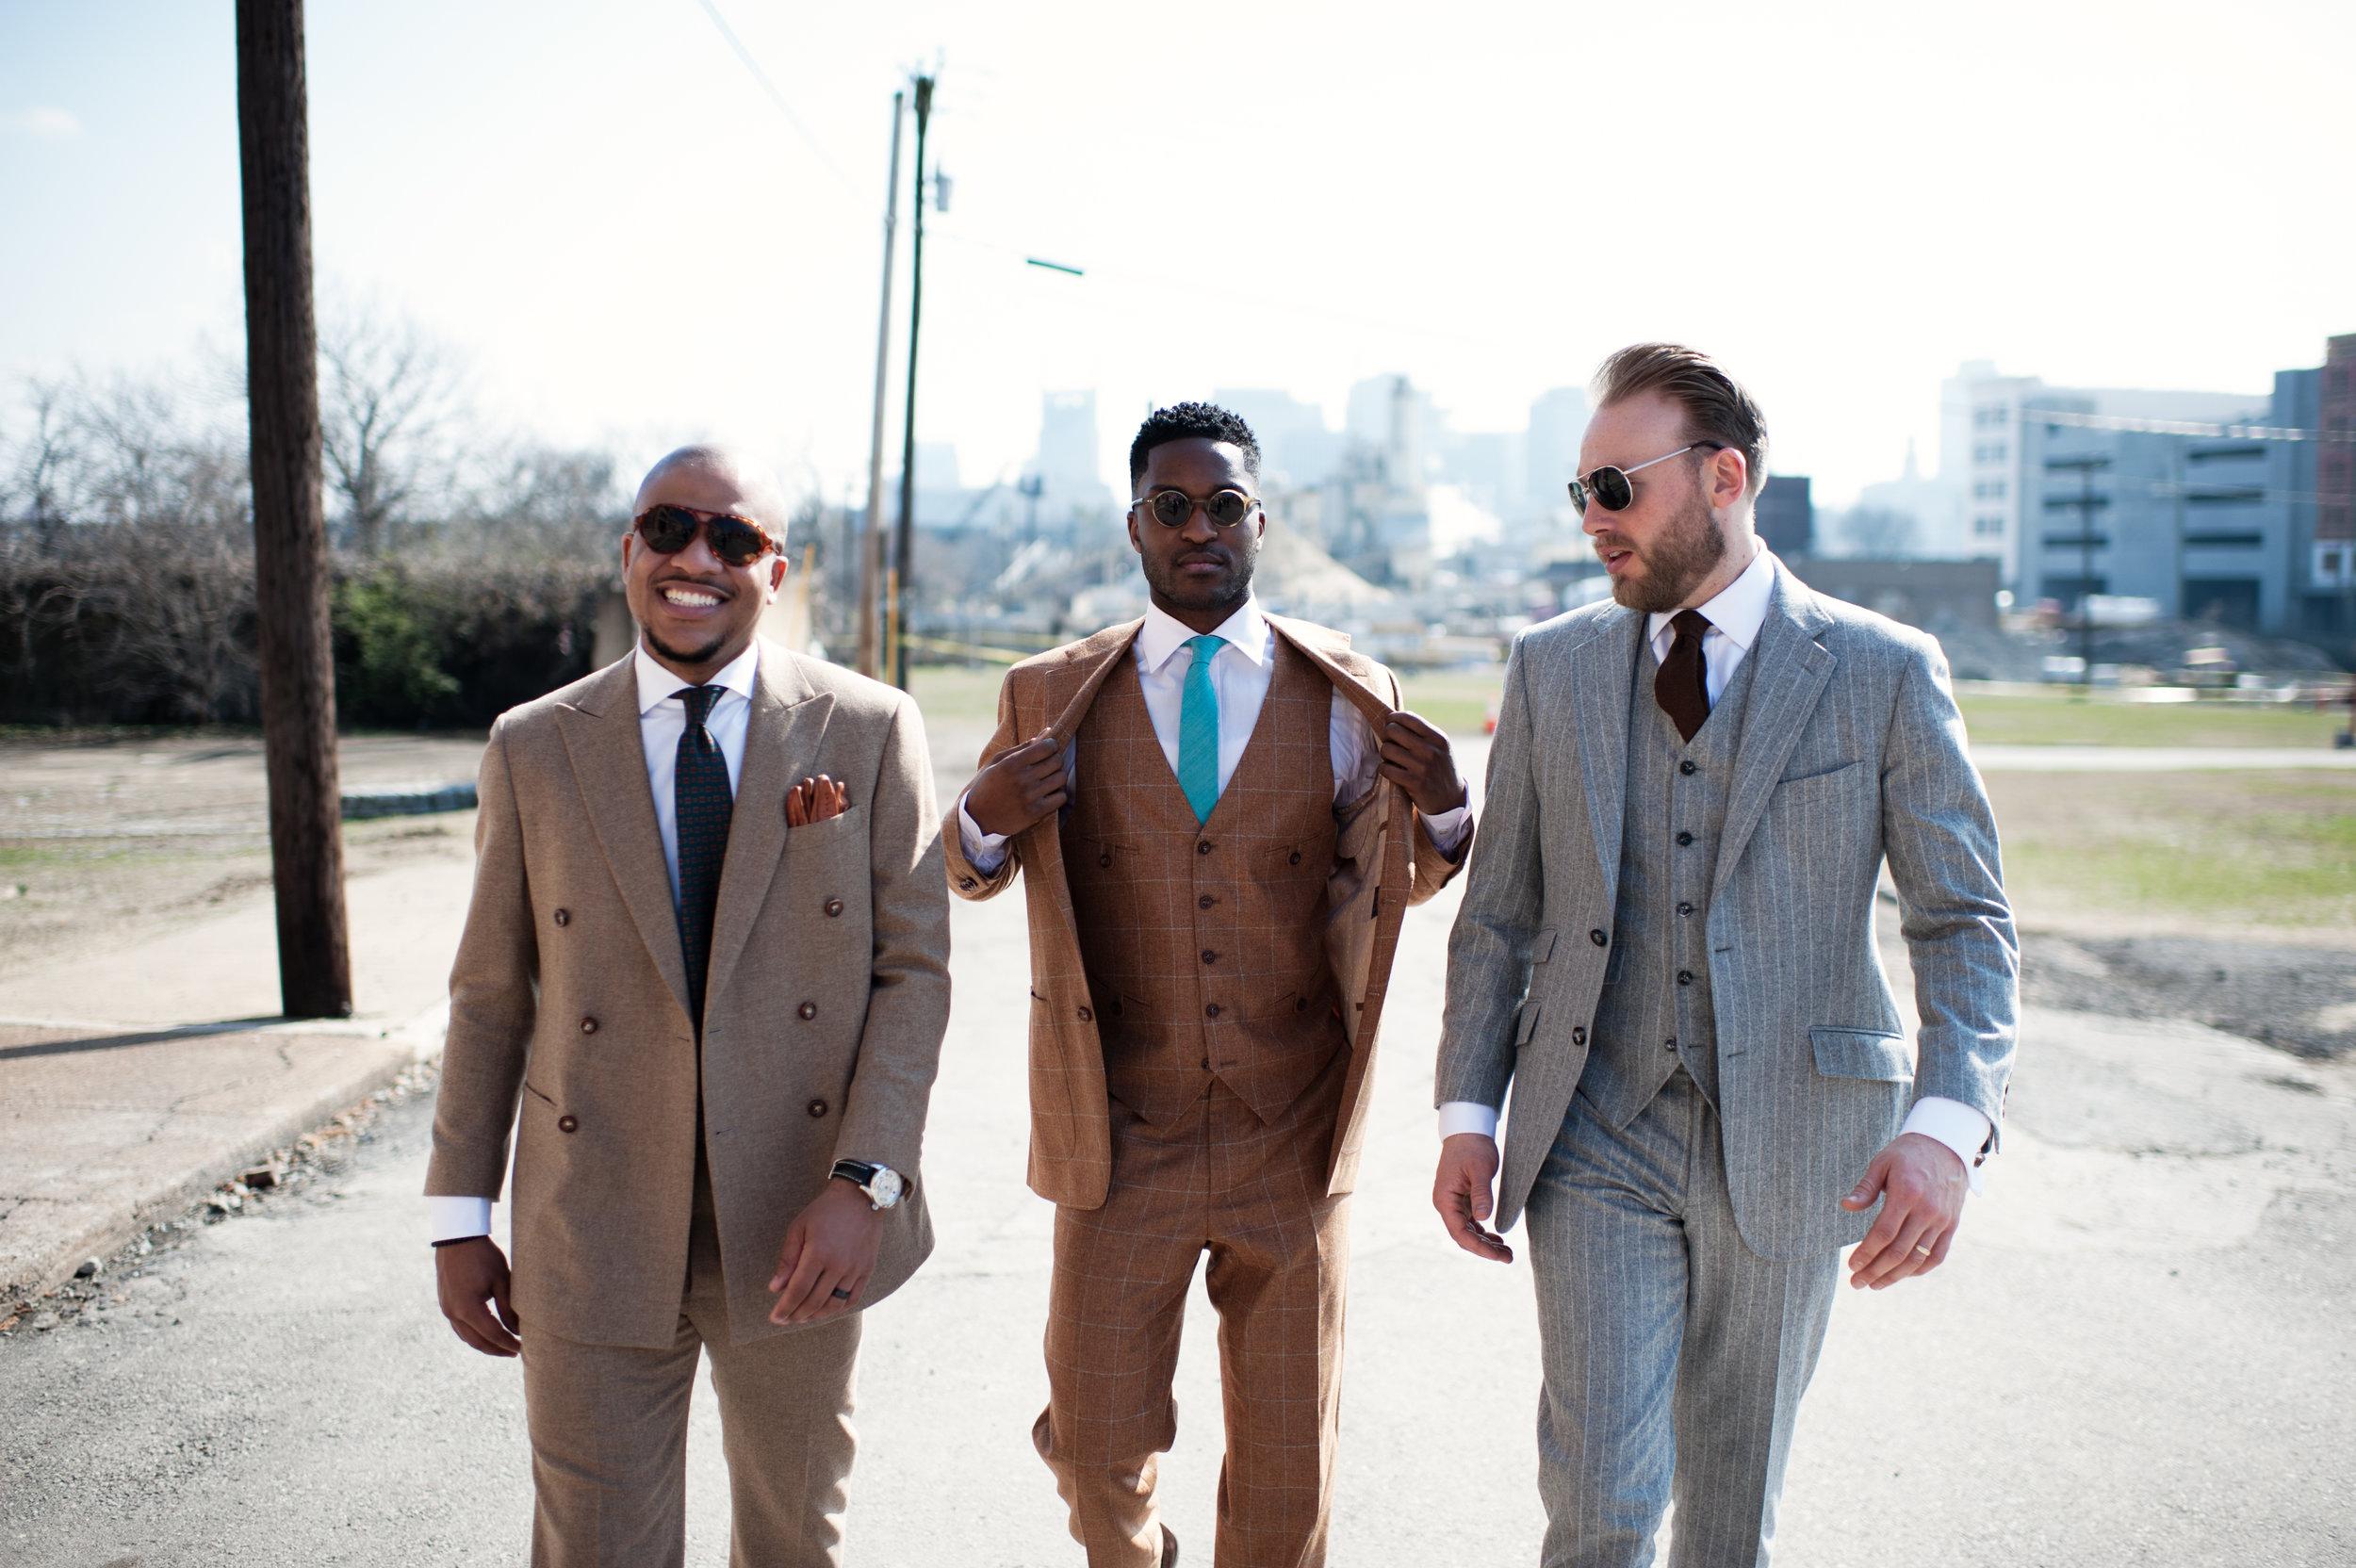 Nashville custom bespoke suit walk